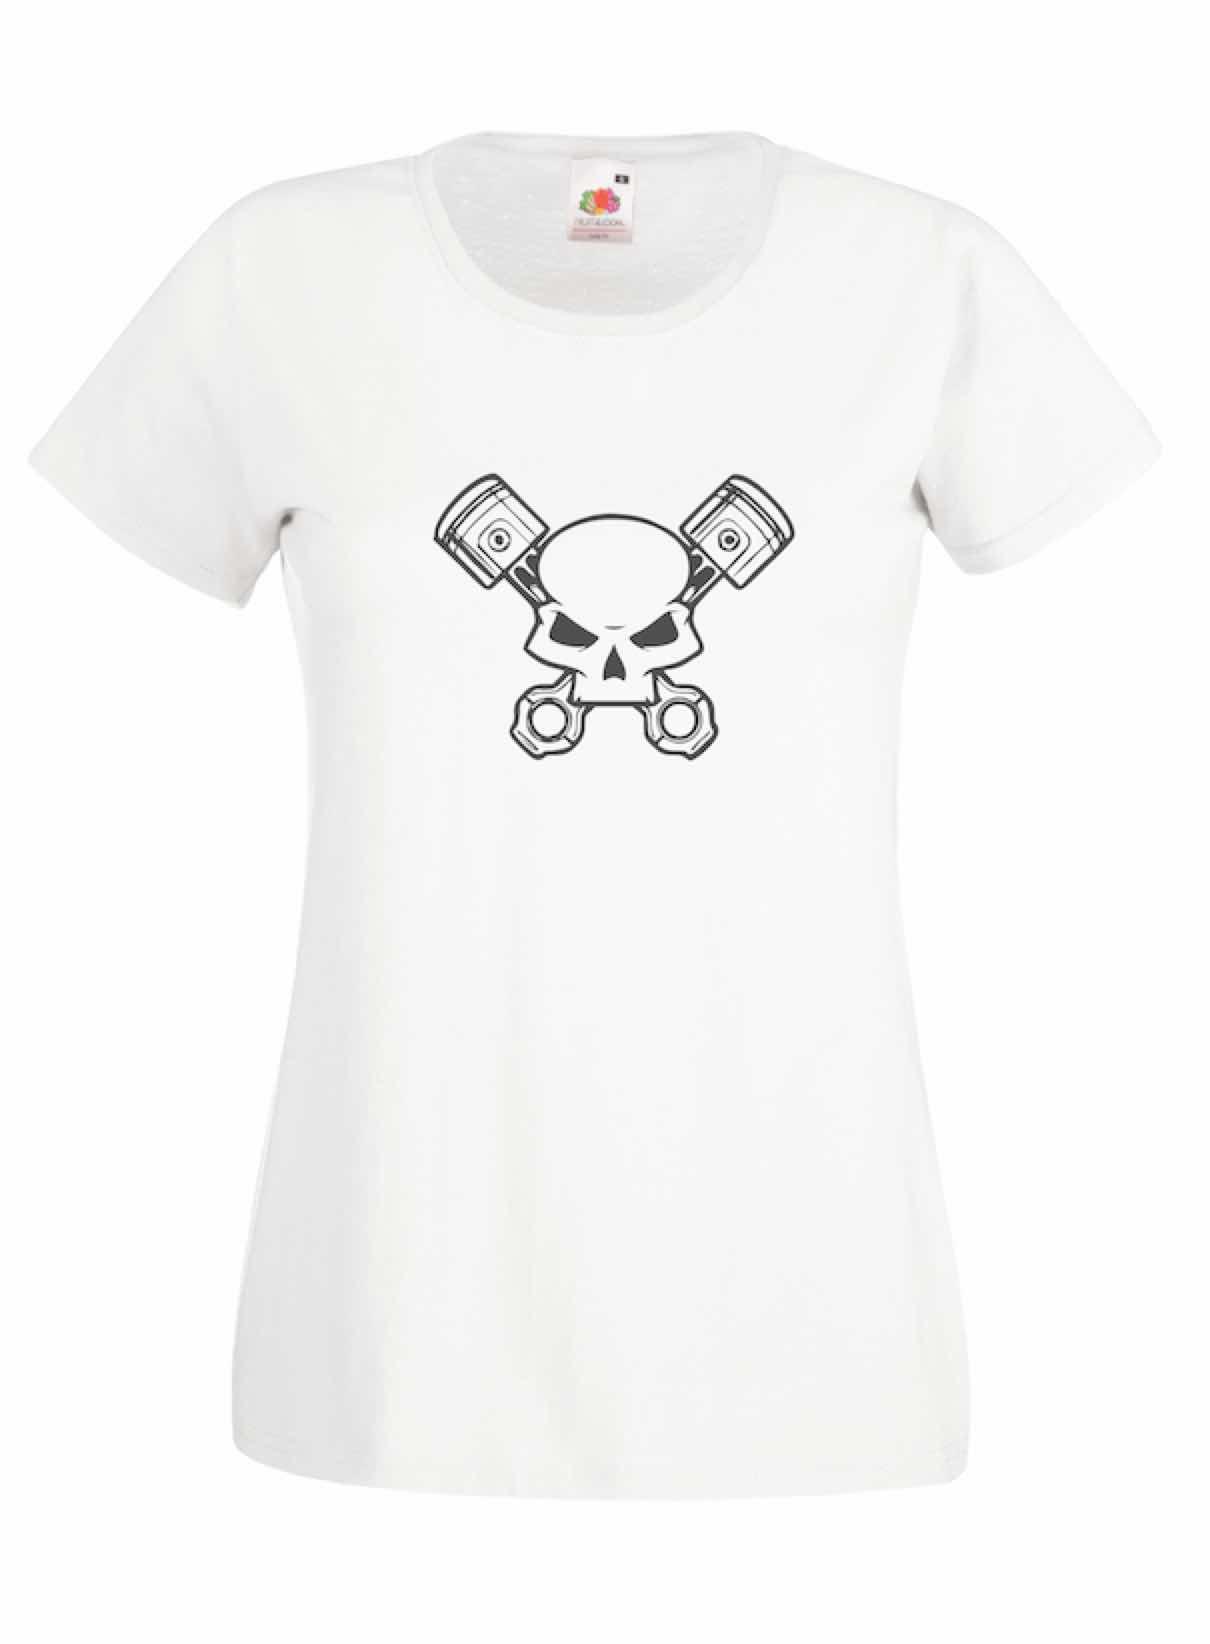 Skull & Pistons design for t-shirt, hoodie & sweatshirt